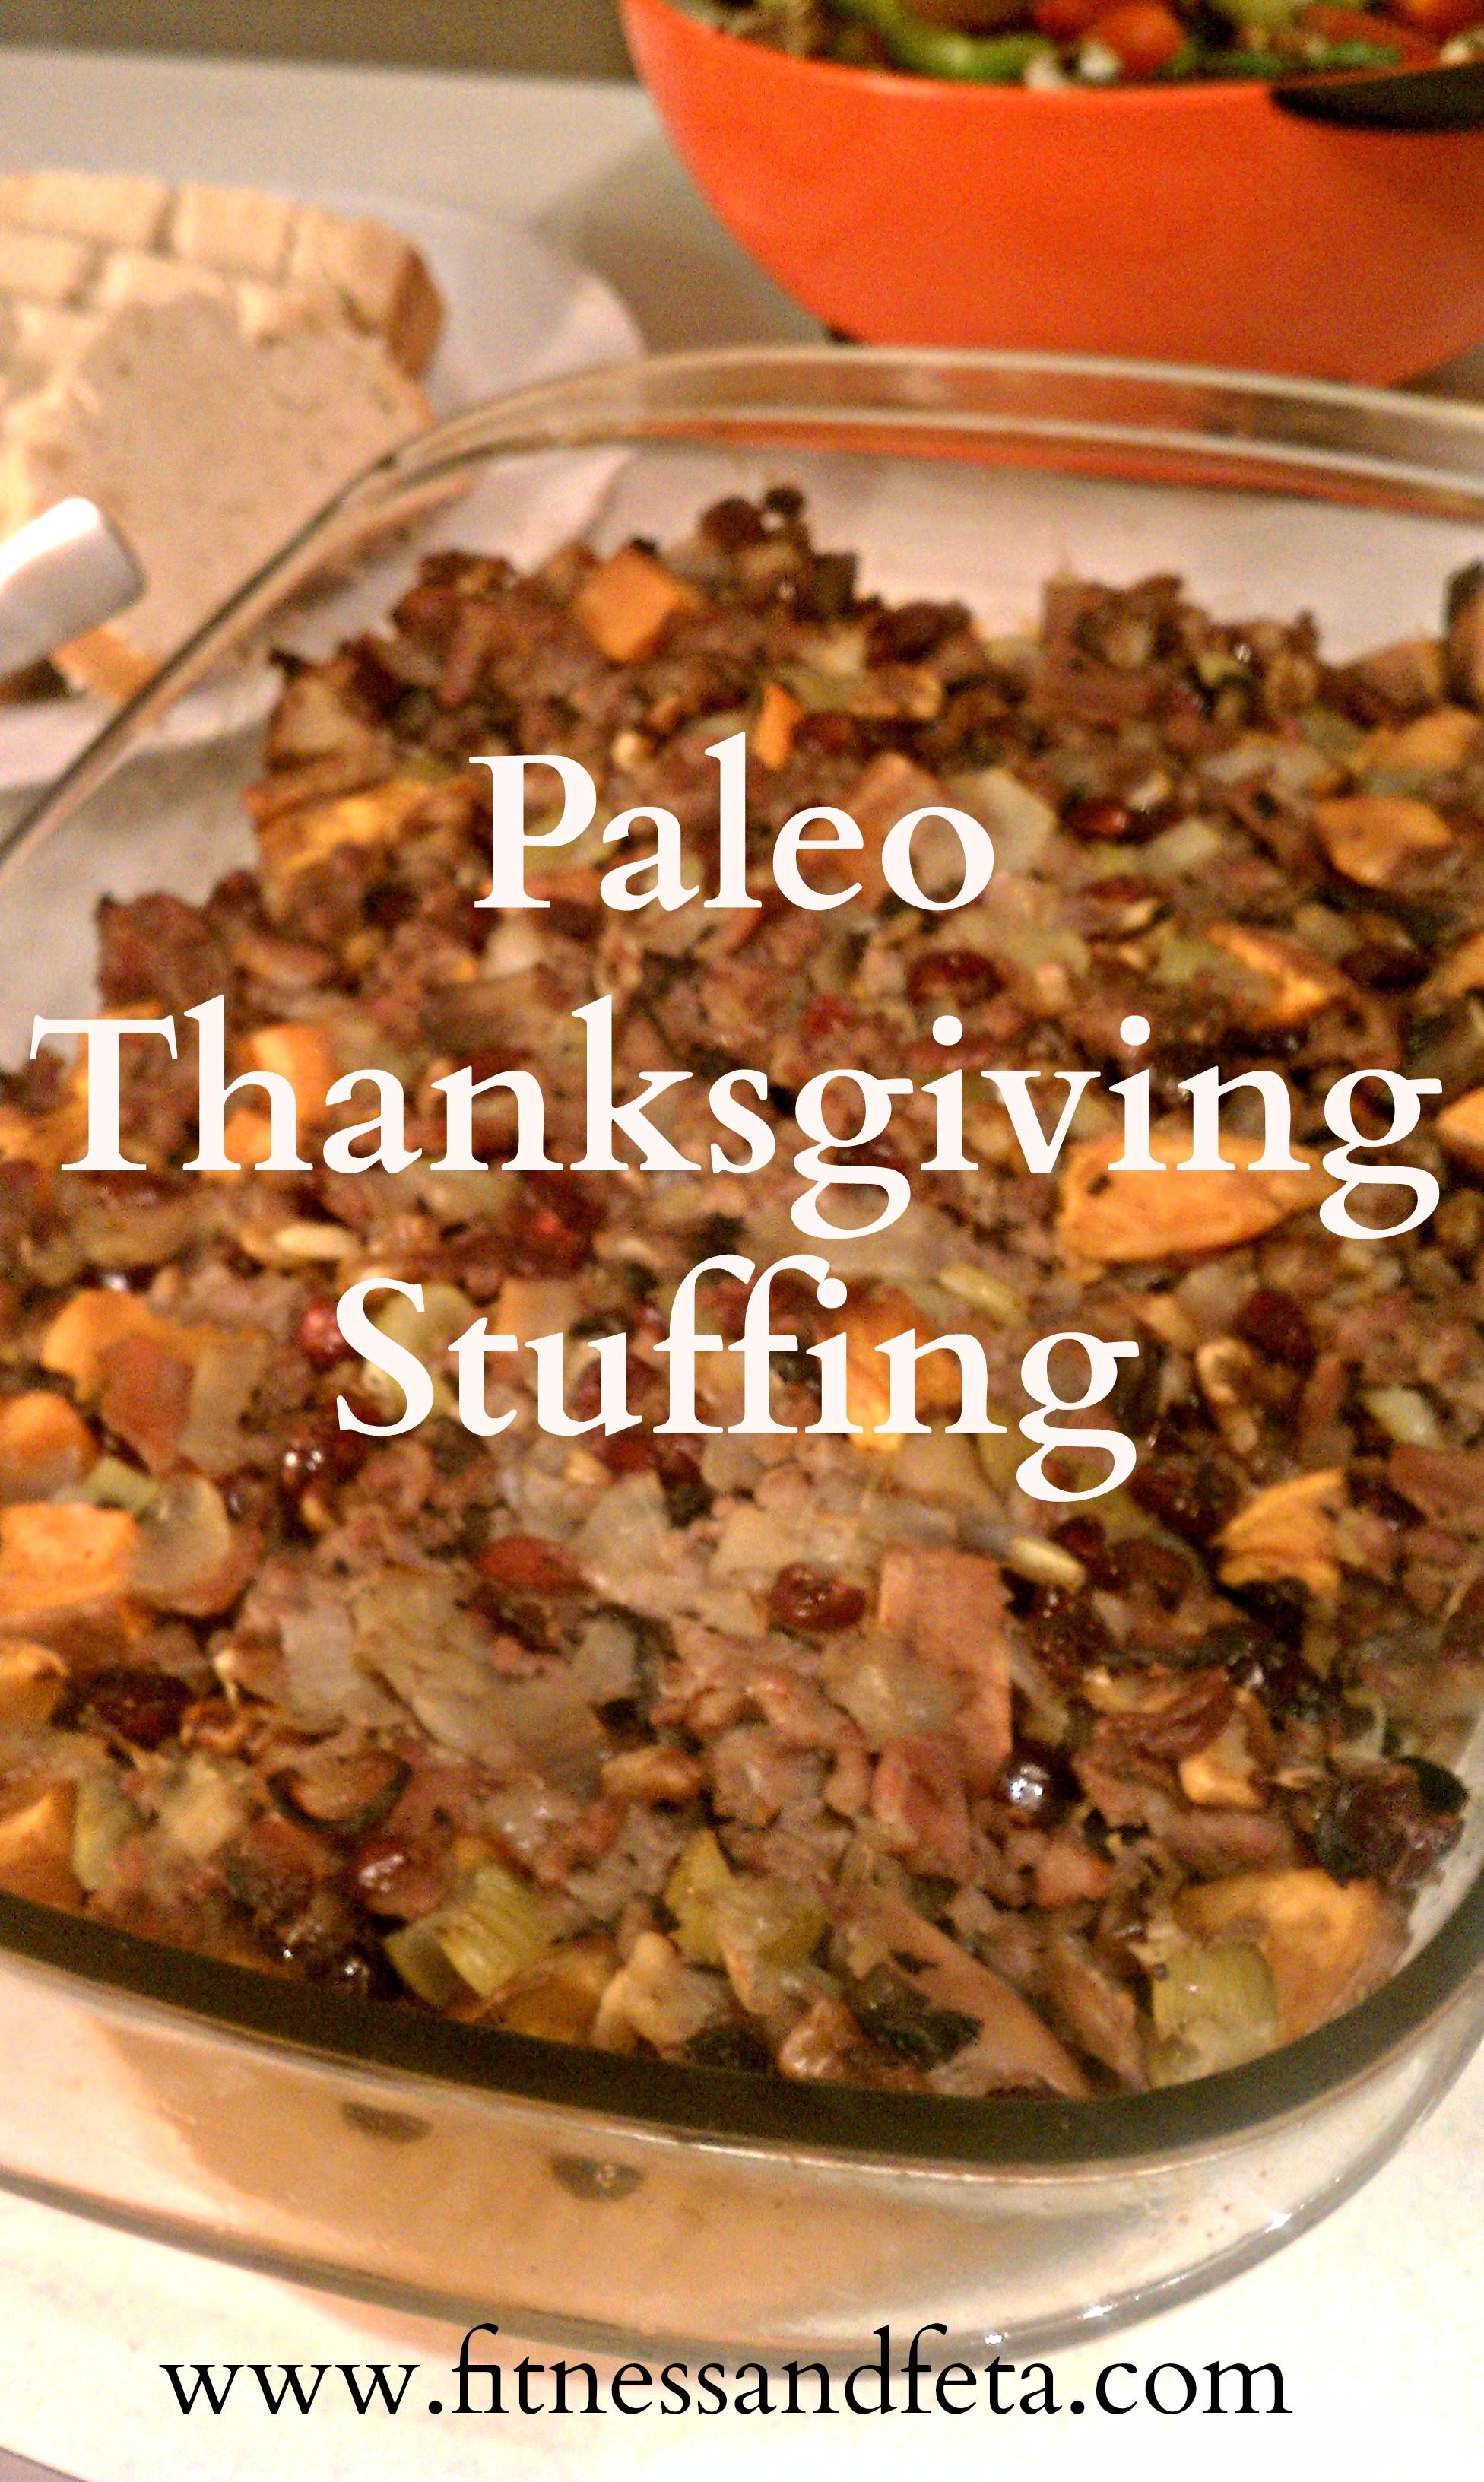 Paleo Thanksgiving Stuffing  Paleo Thanksgiving Stuffing